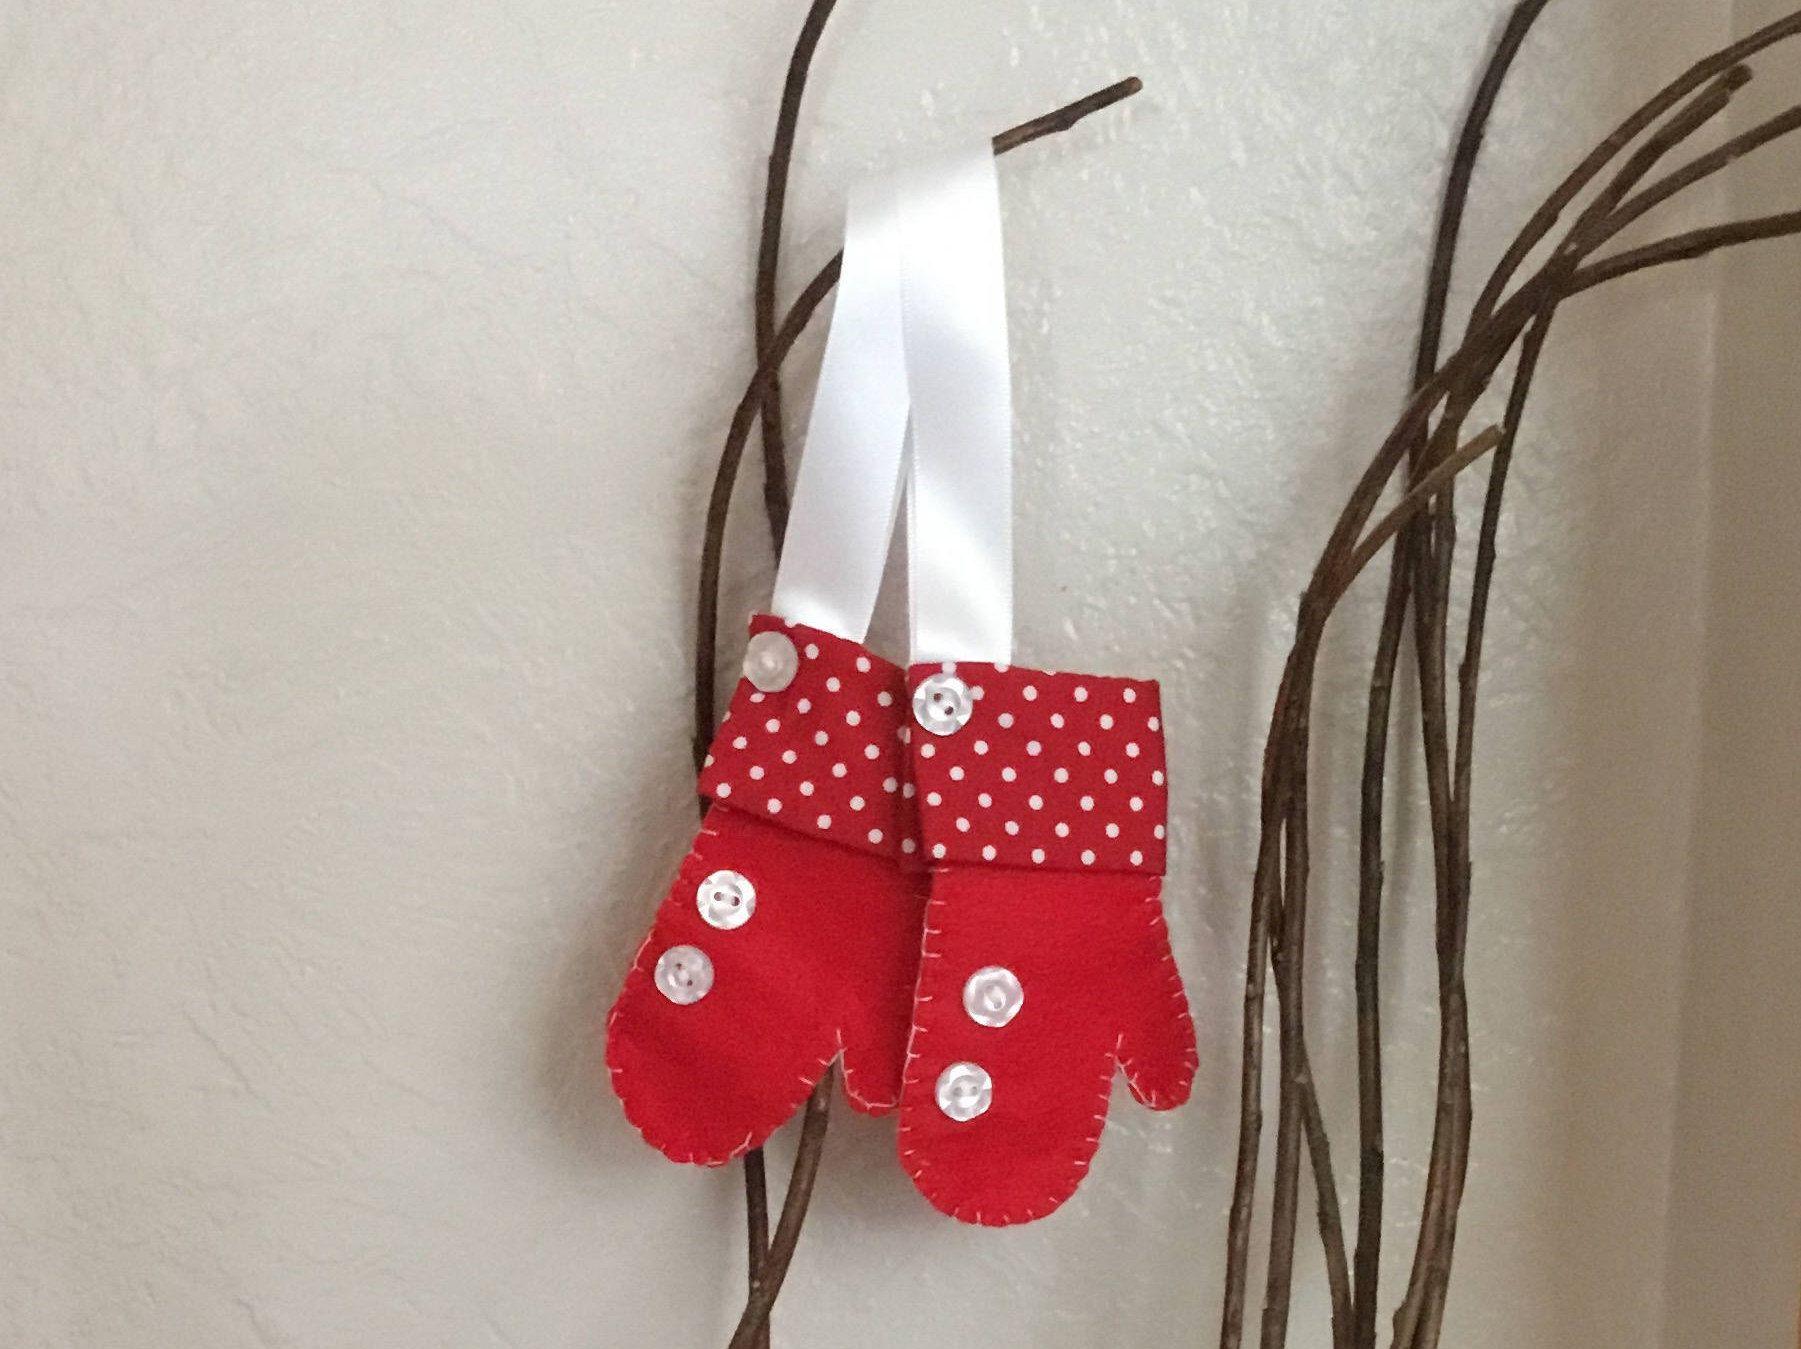 Mitten christmas decorations - Christmas Mitten Ornament Felt Mittens Christmas Decoration Hanging Mitten Red Mitten